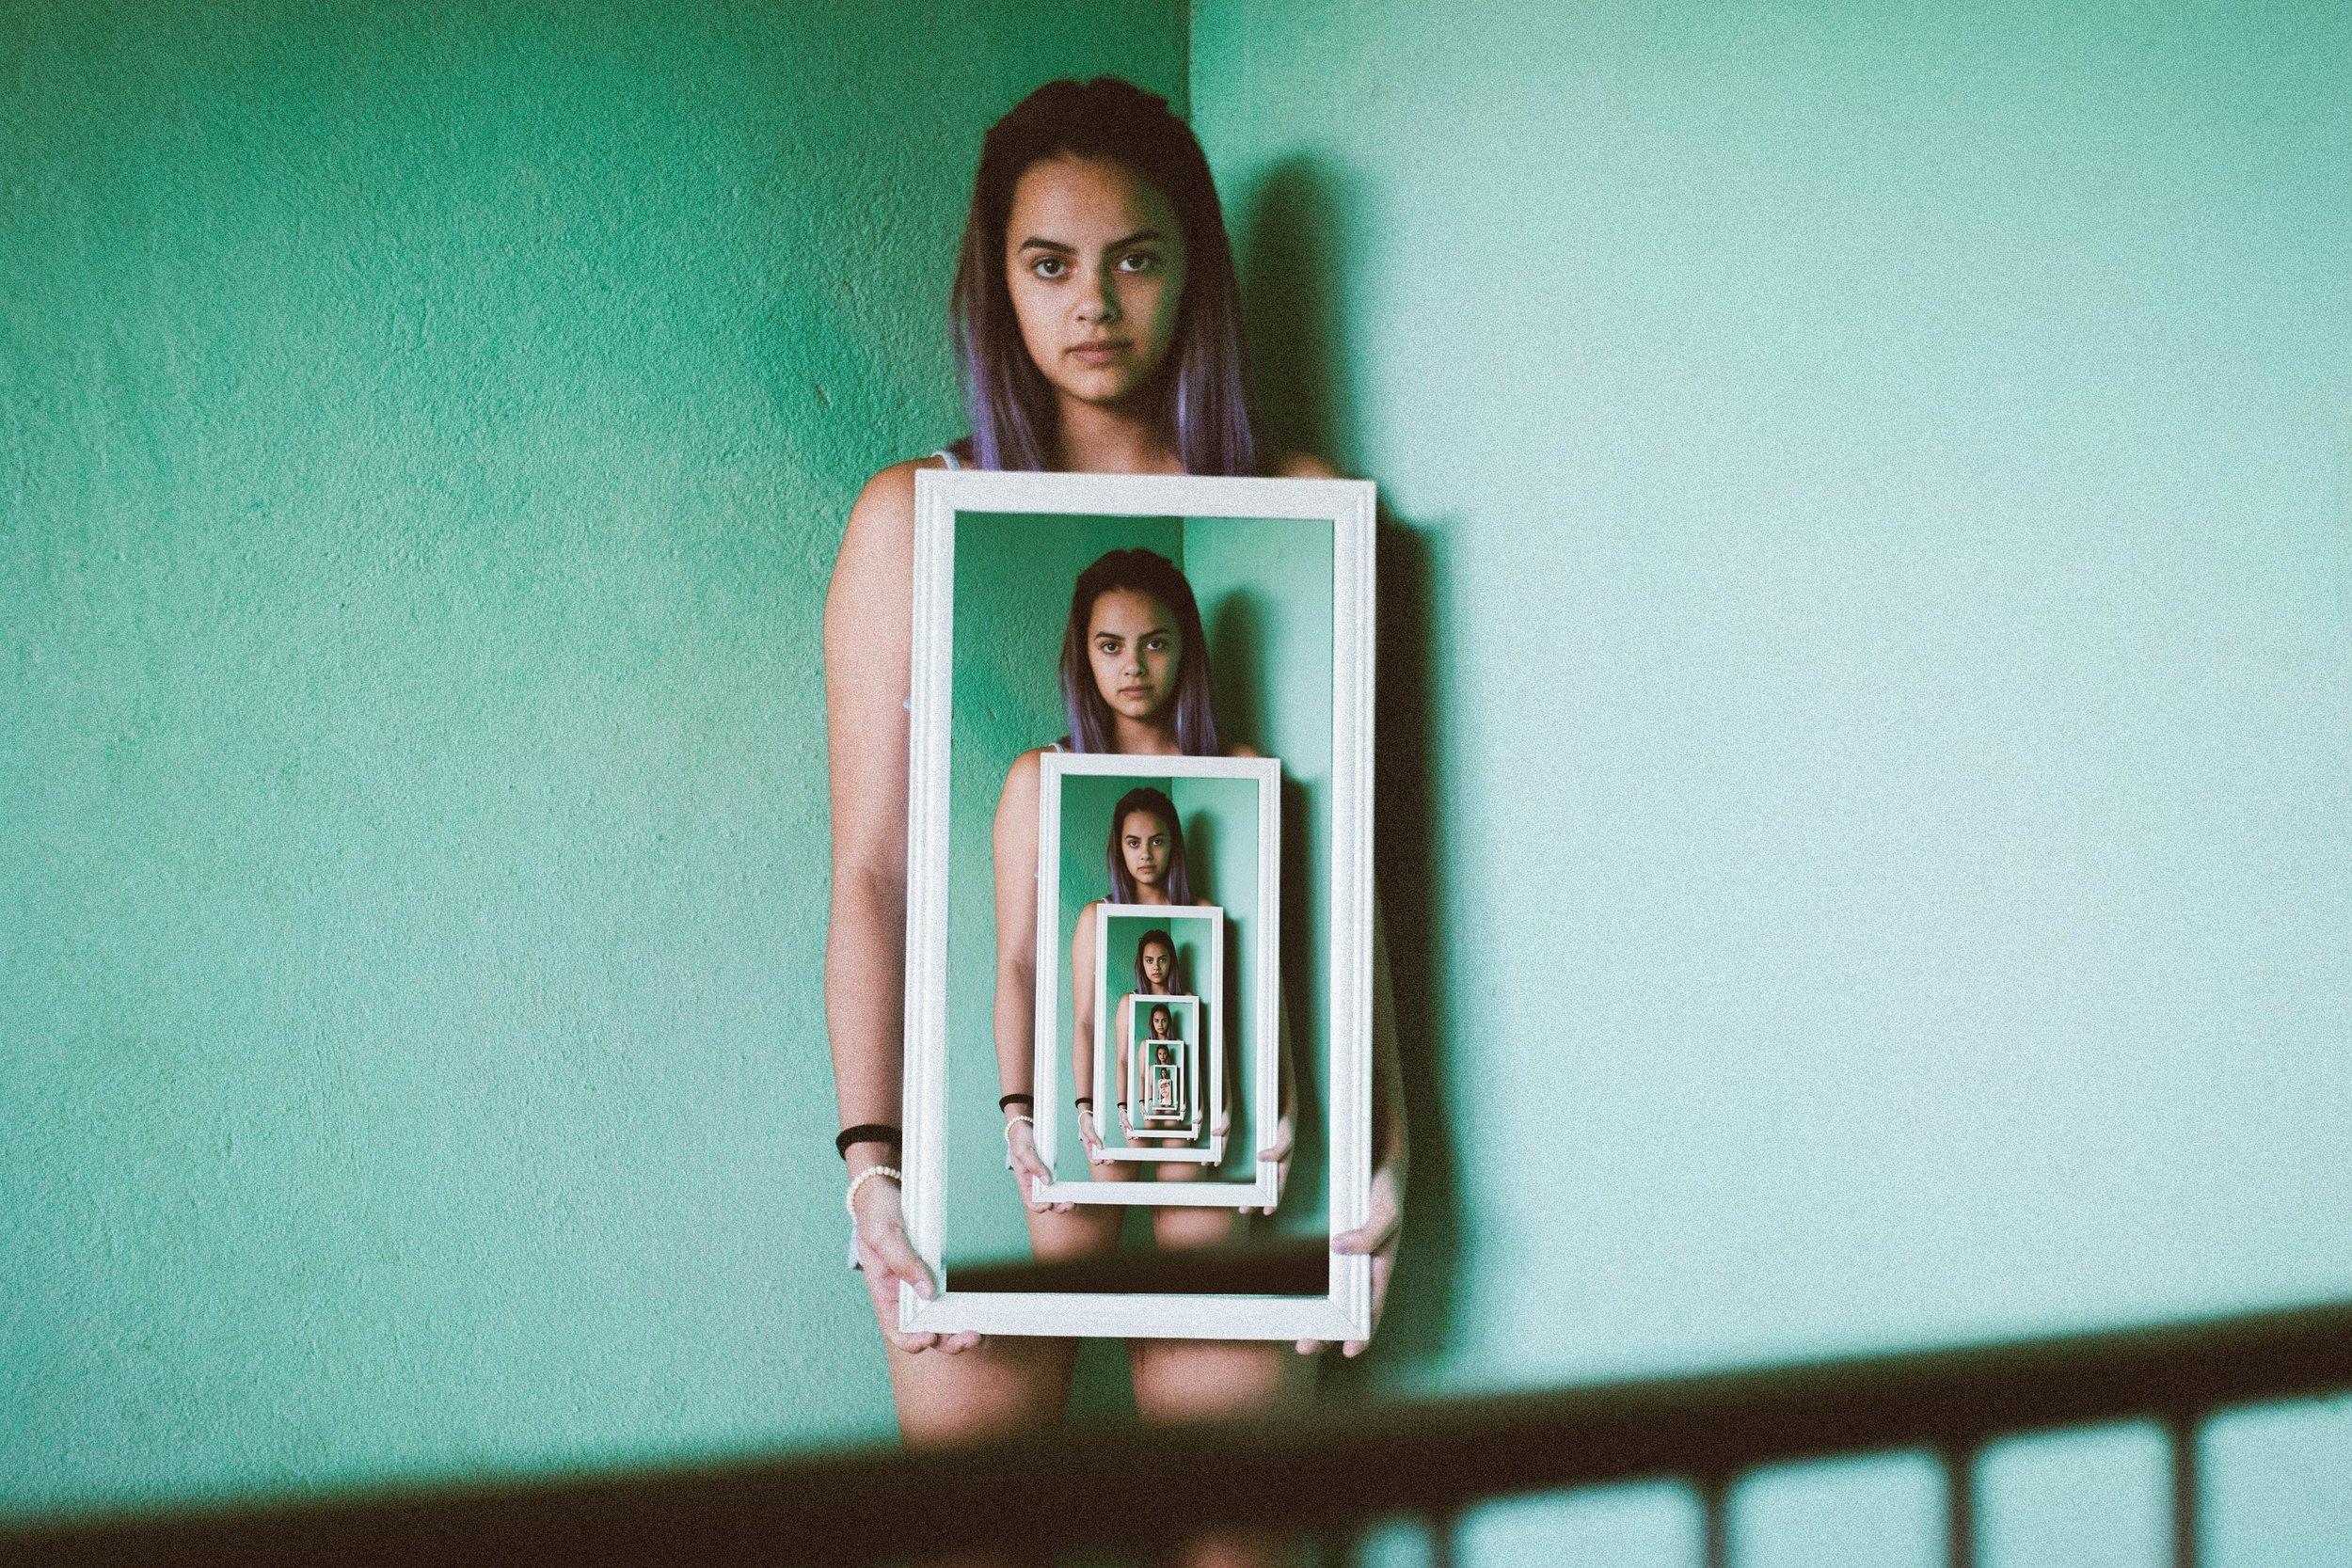 BODY IMAGE & EATING DISORDERS